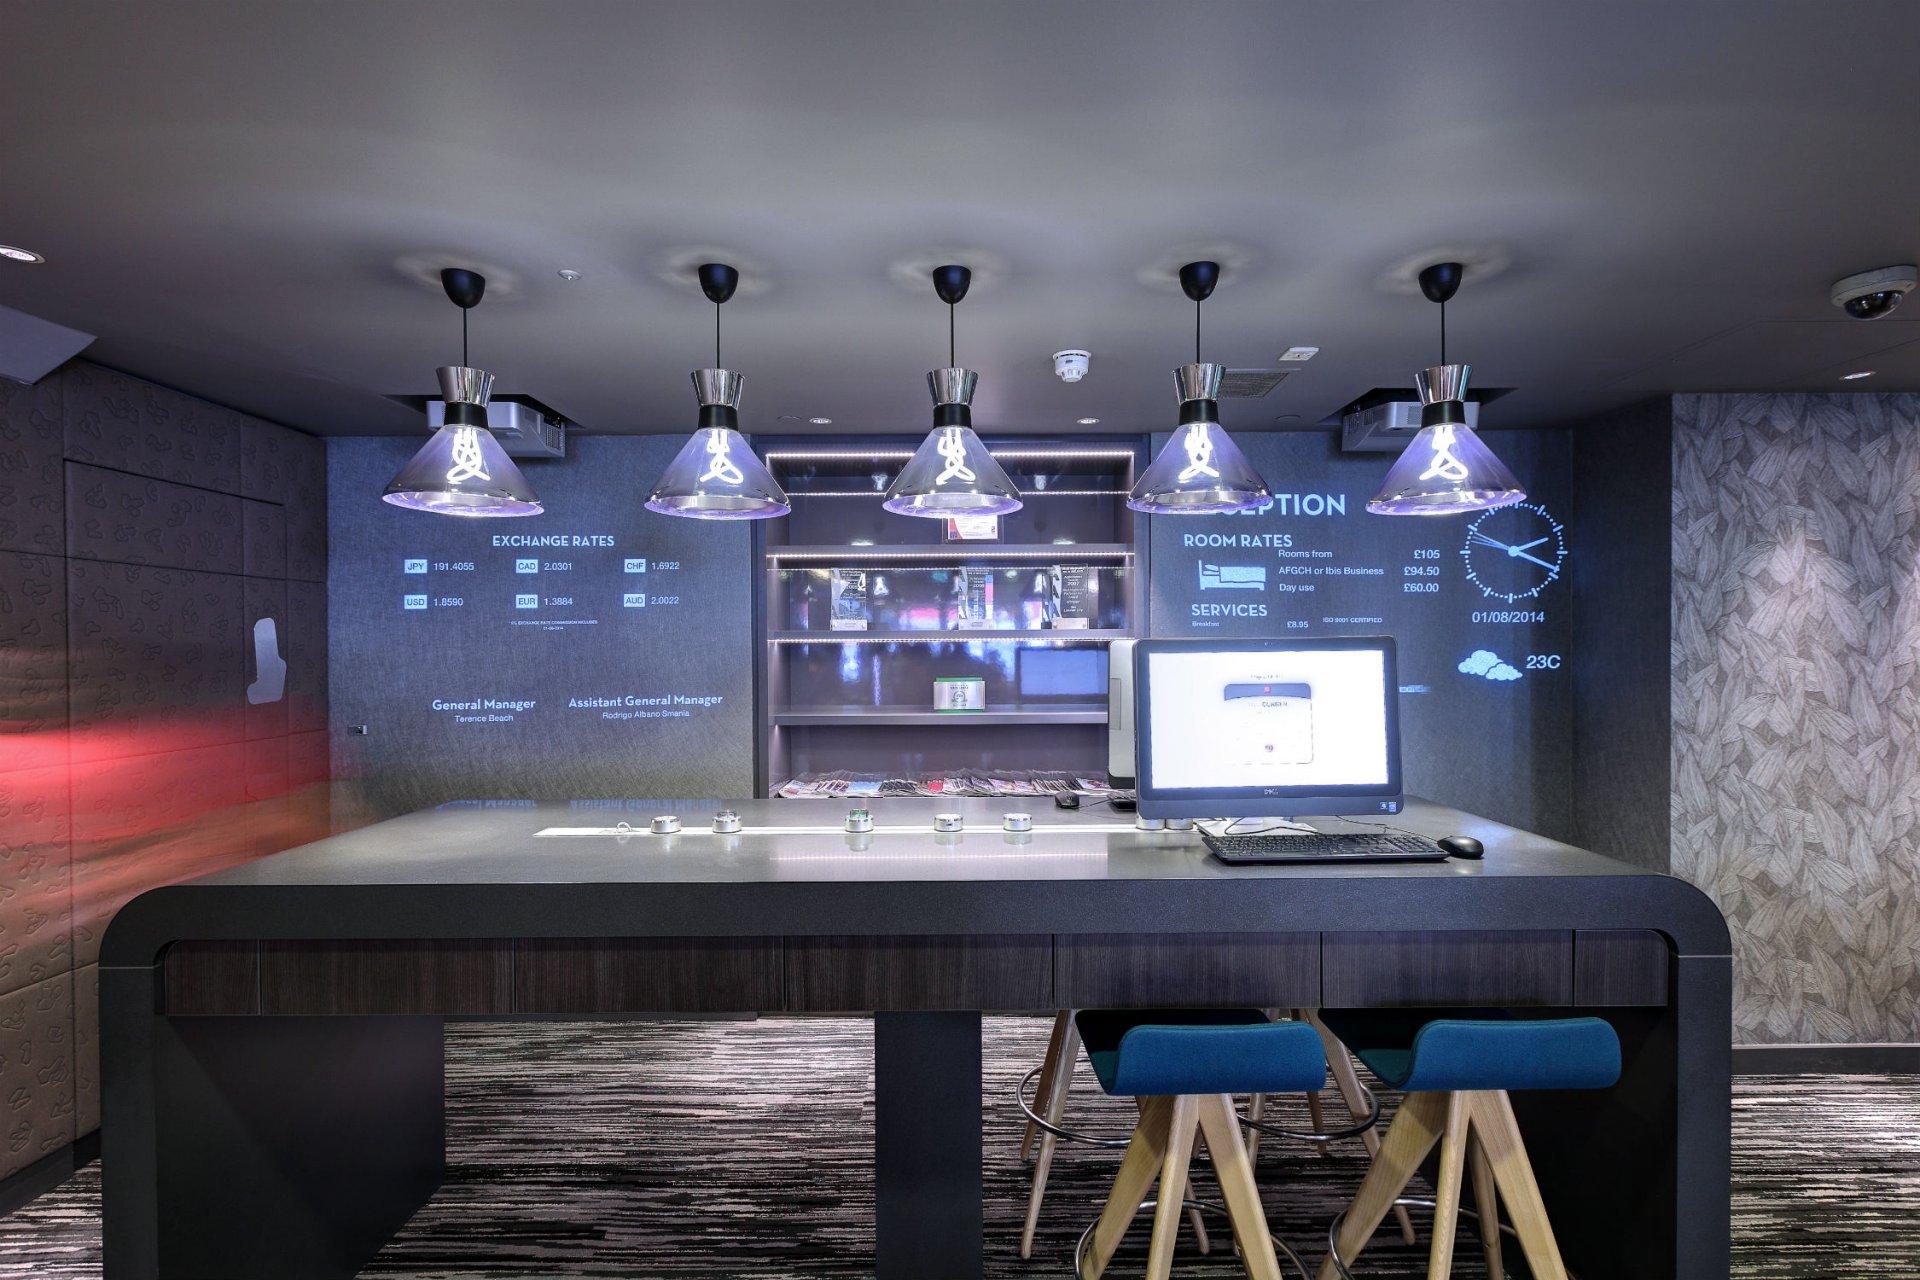 009_Plumen-001-designer-light-bulb-with-Lightyears-Pharoah-lampshade-in-Ibis-hotel__2_ Pharaoh Hulger